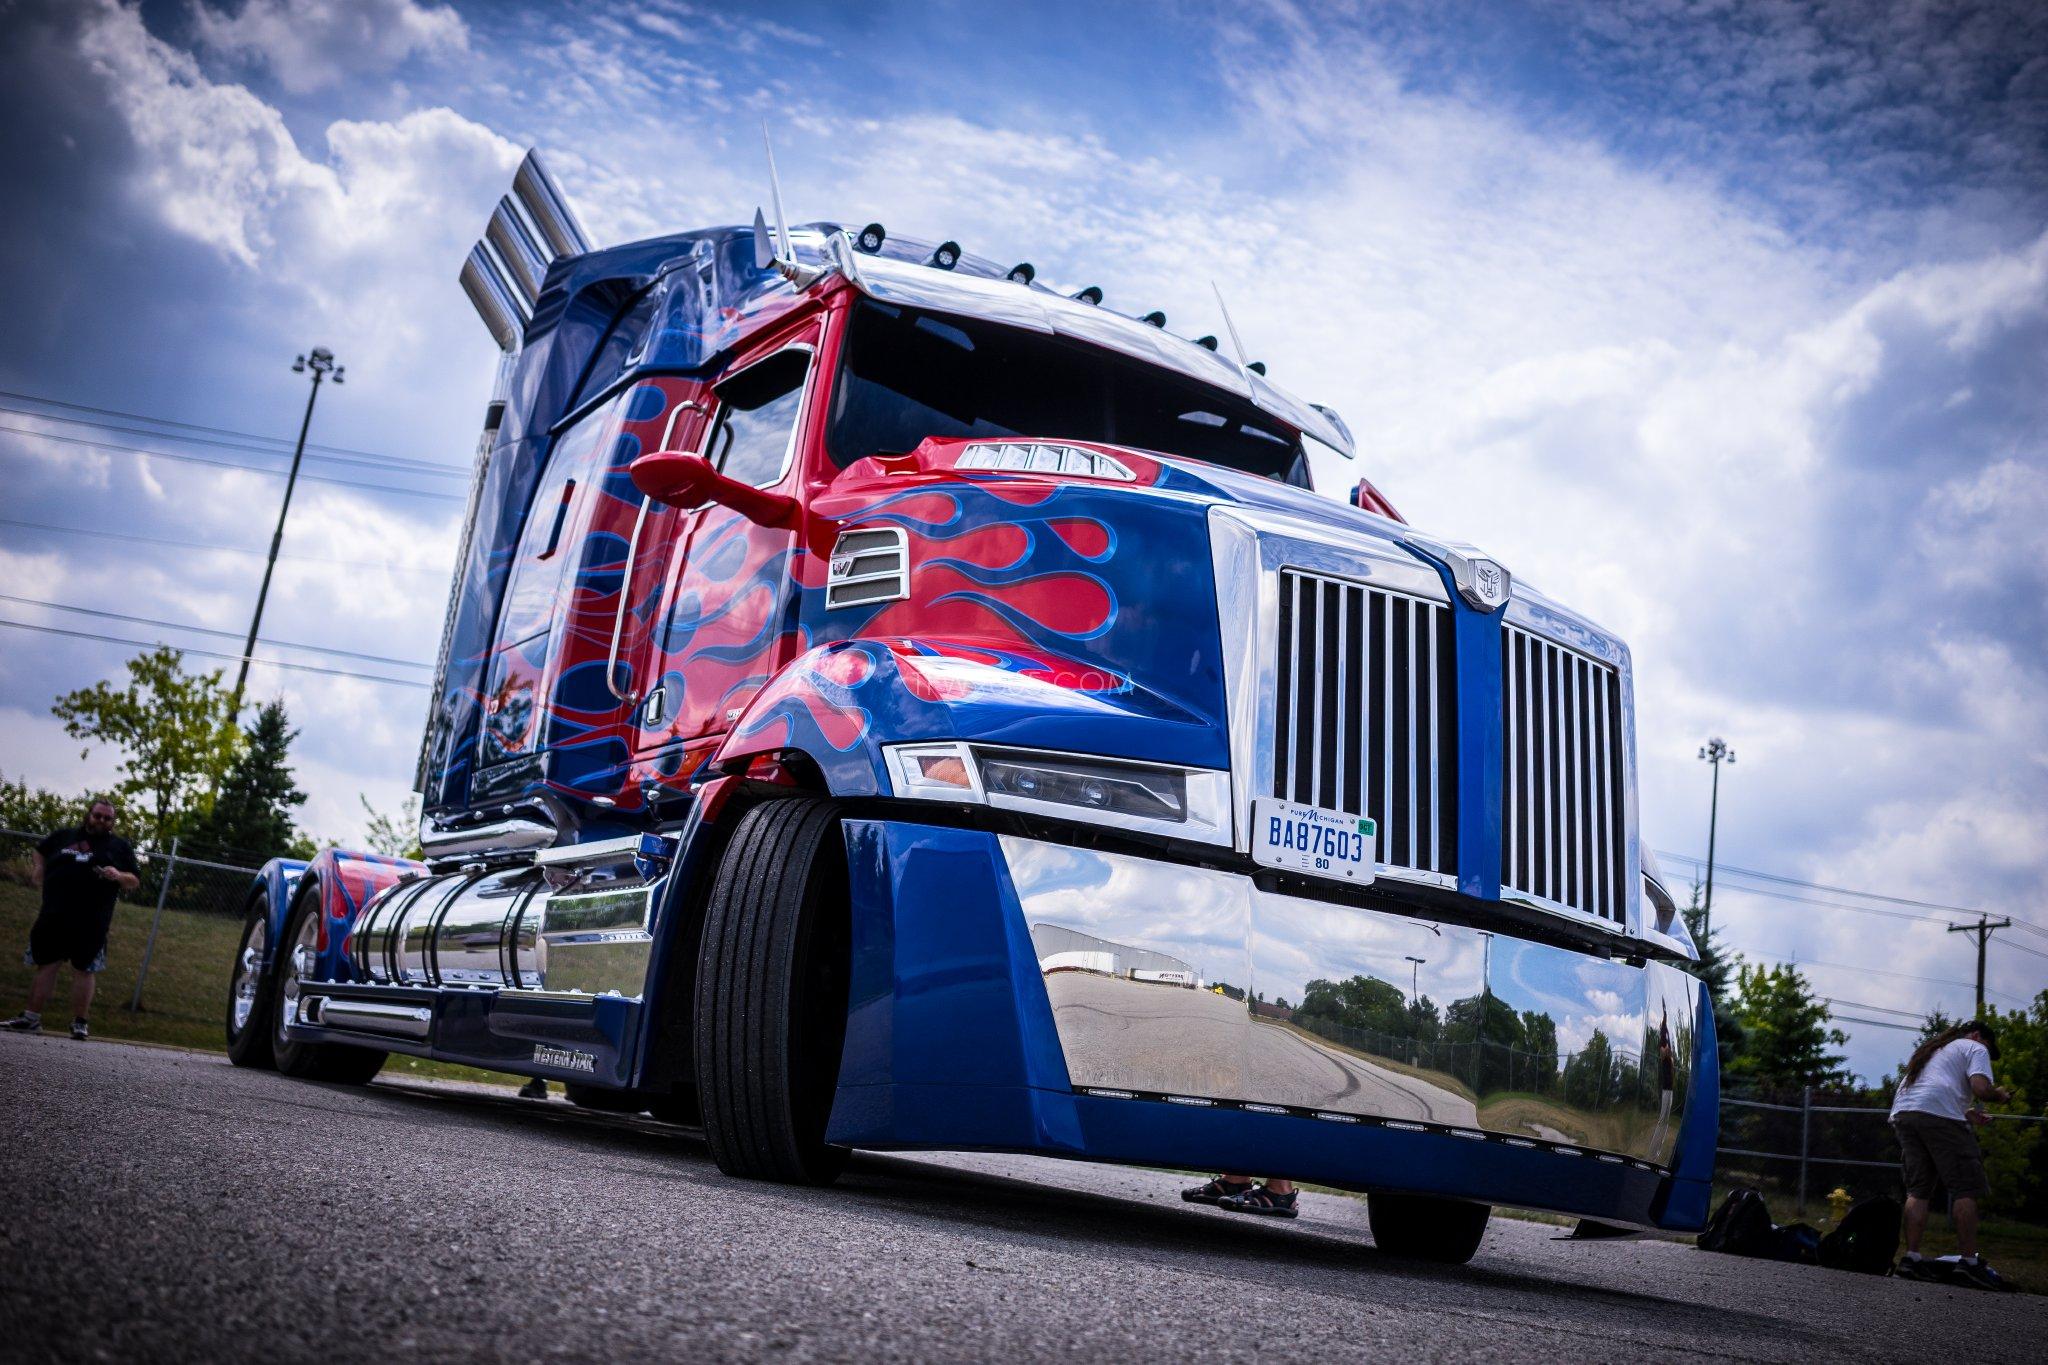 Transformers 5 Set Visit 013